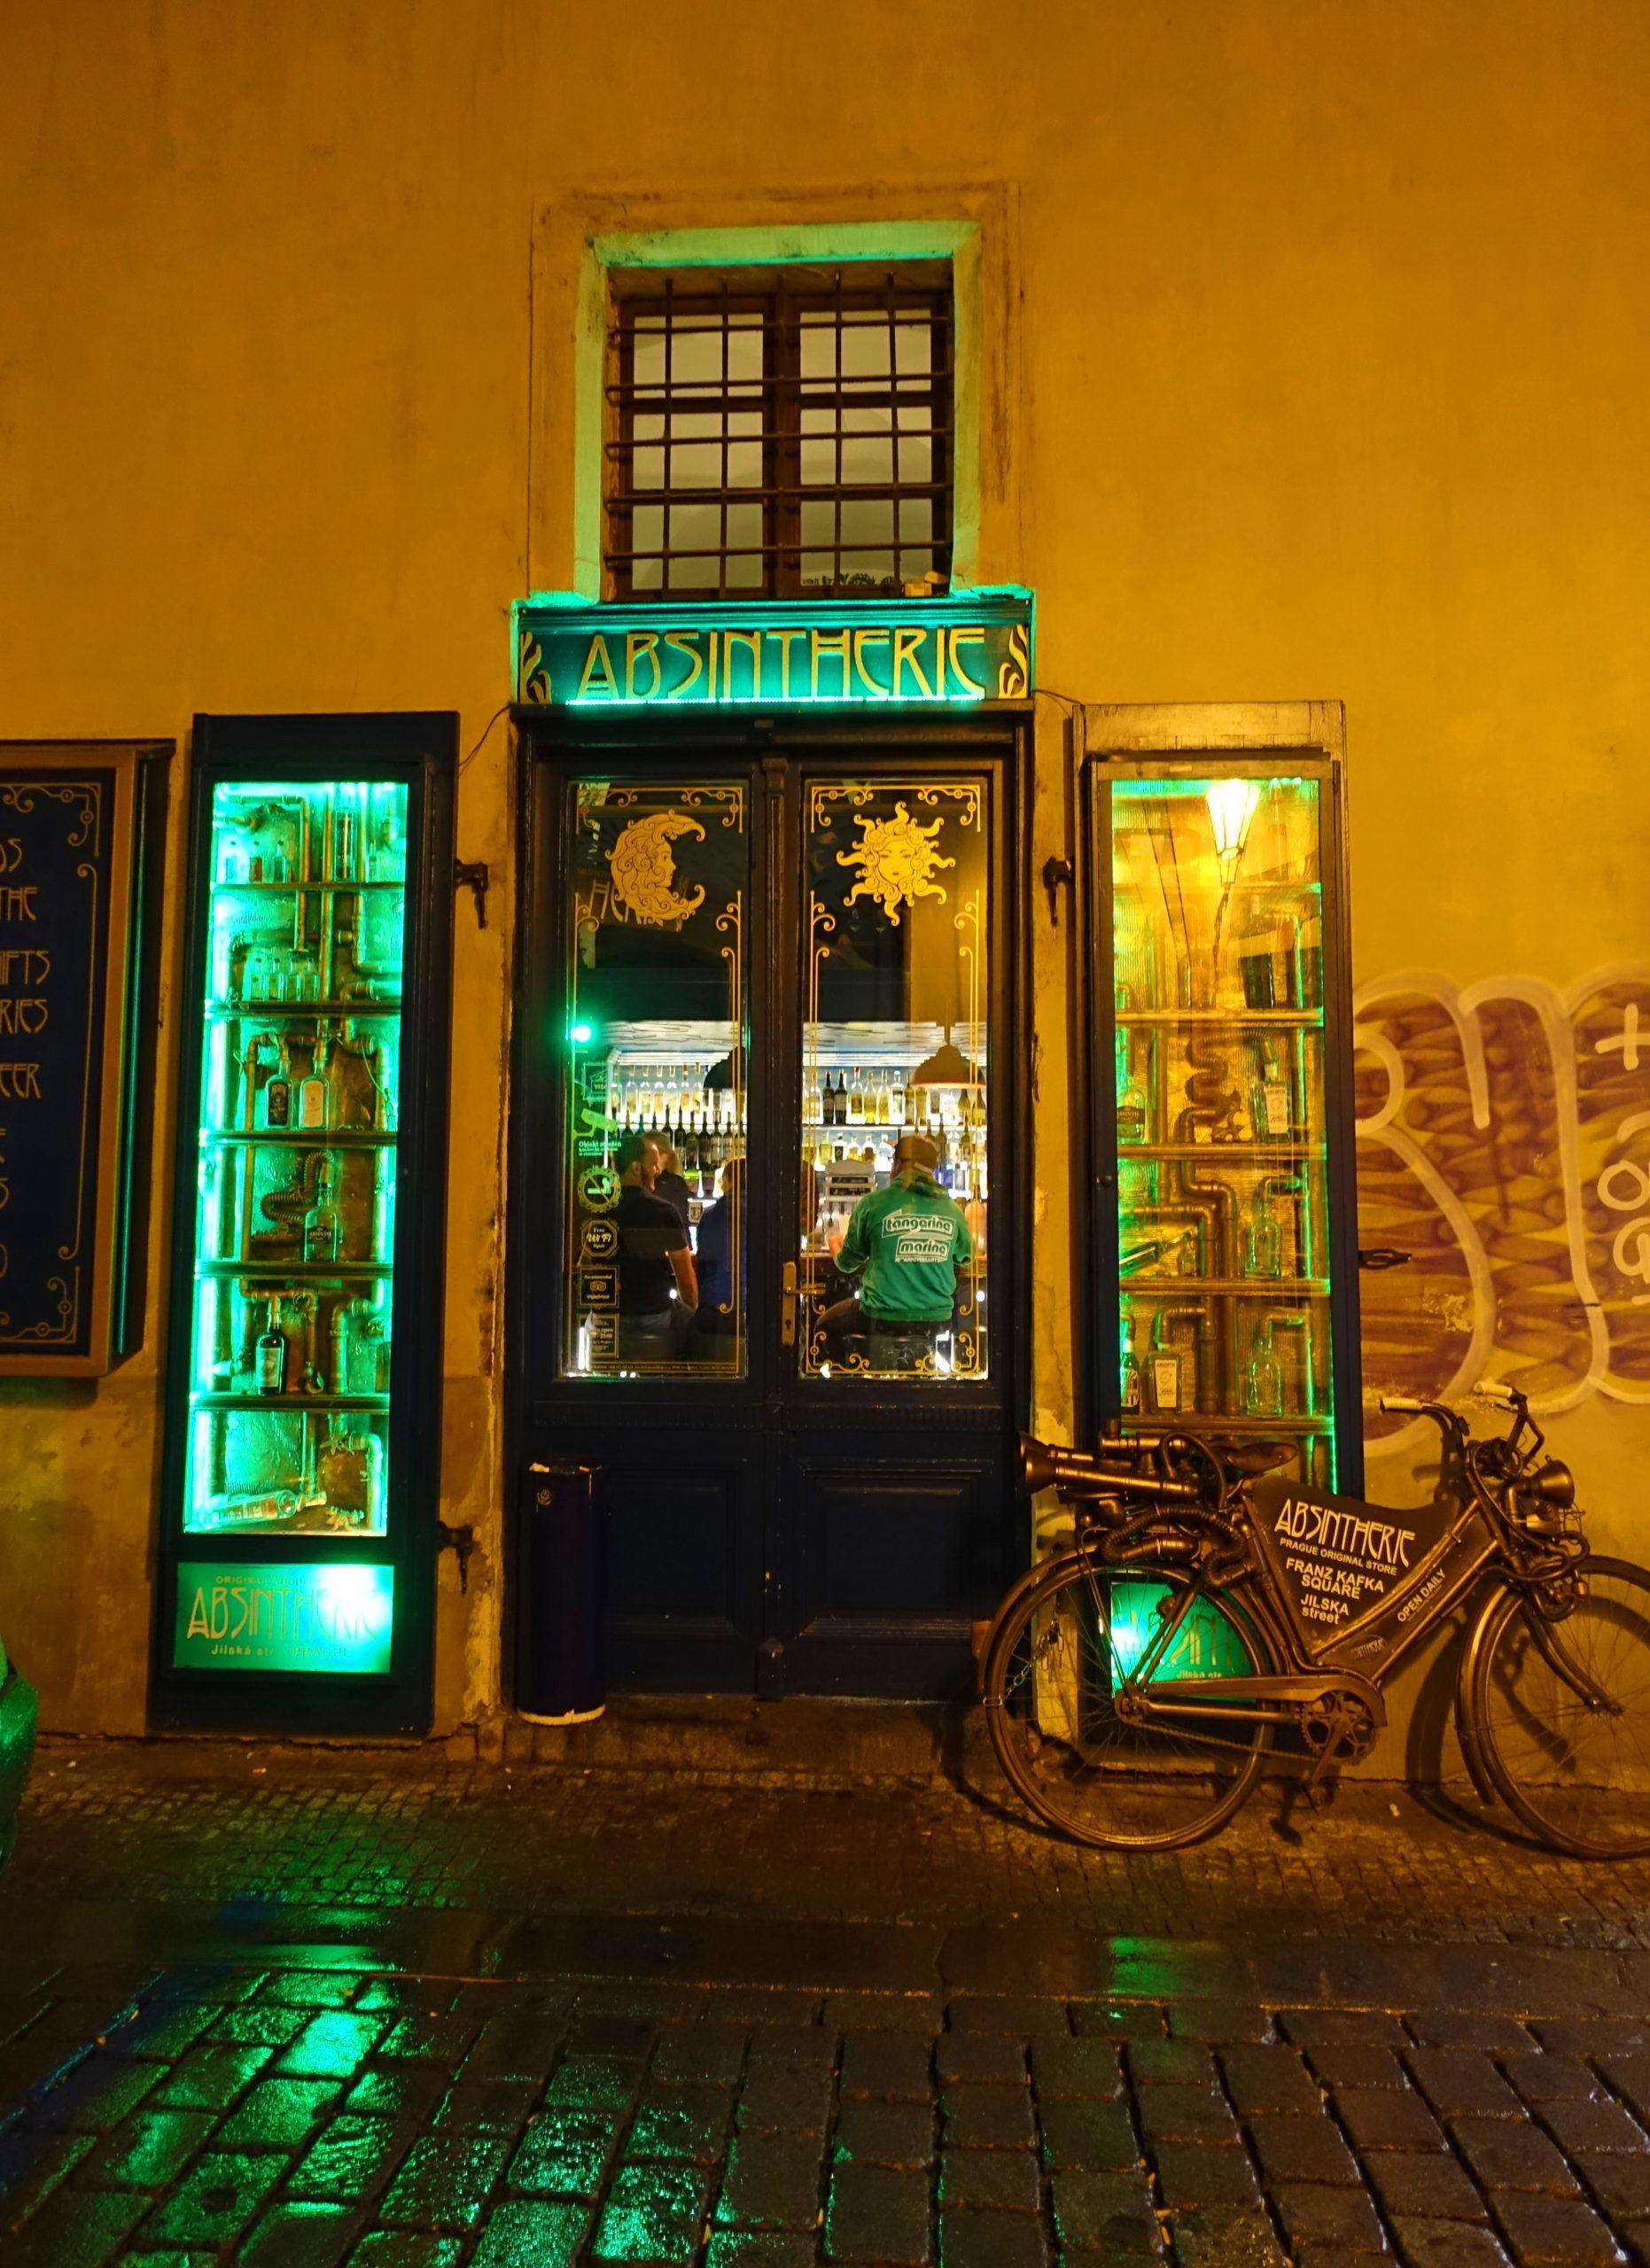 It looks like an Irish bar, but it's not.